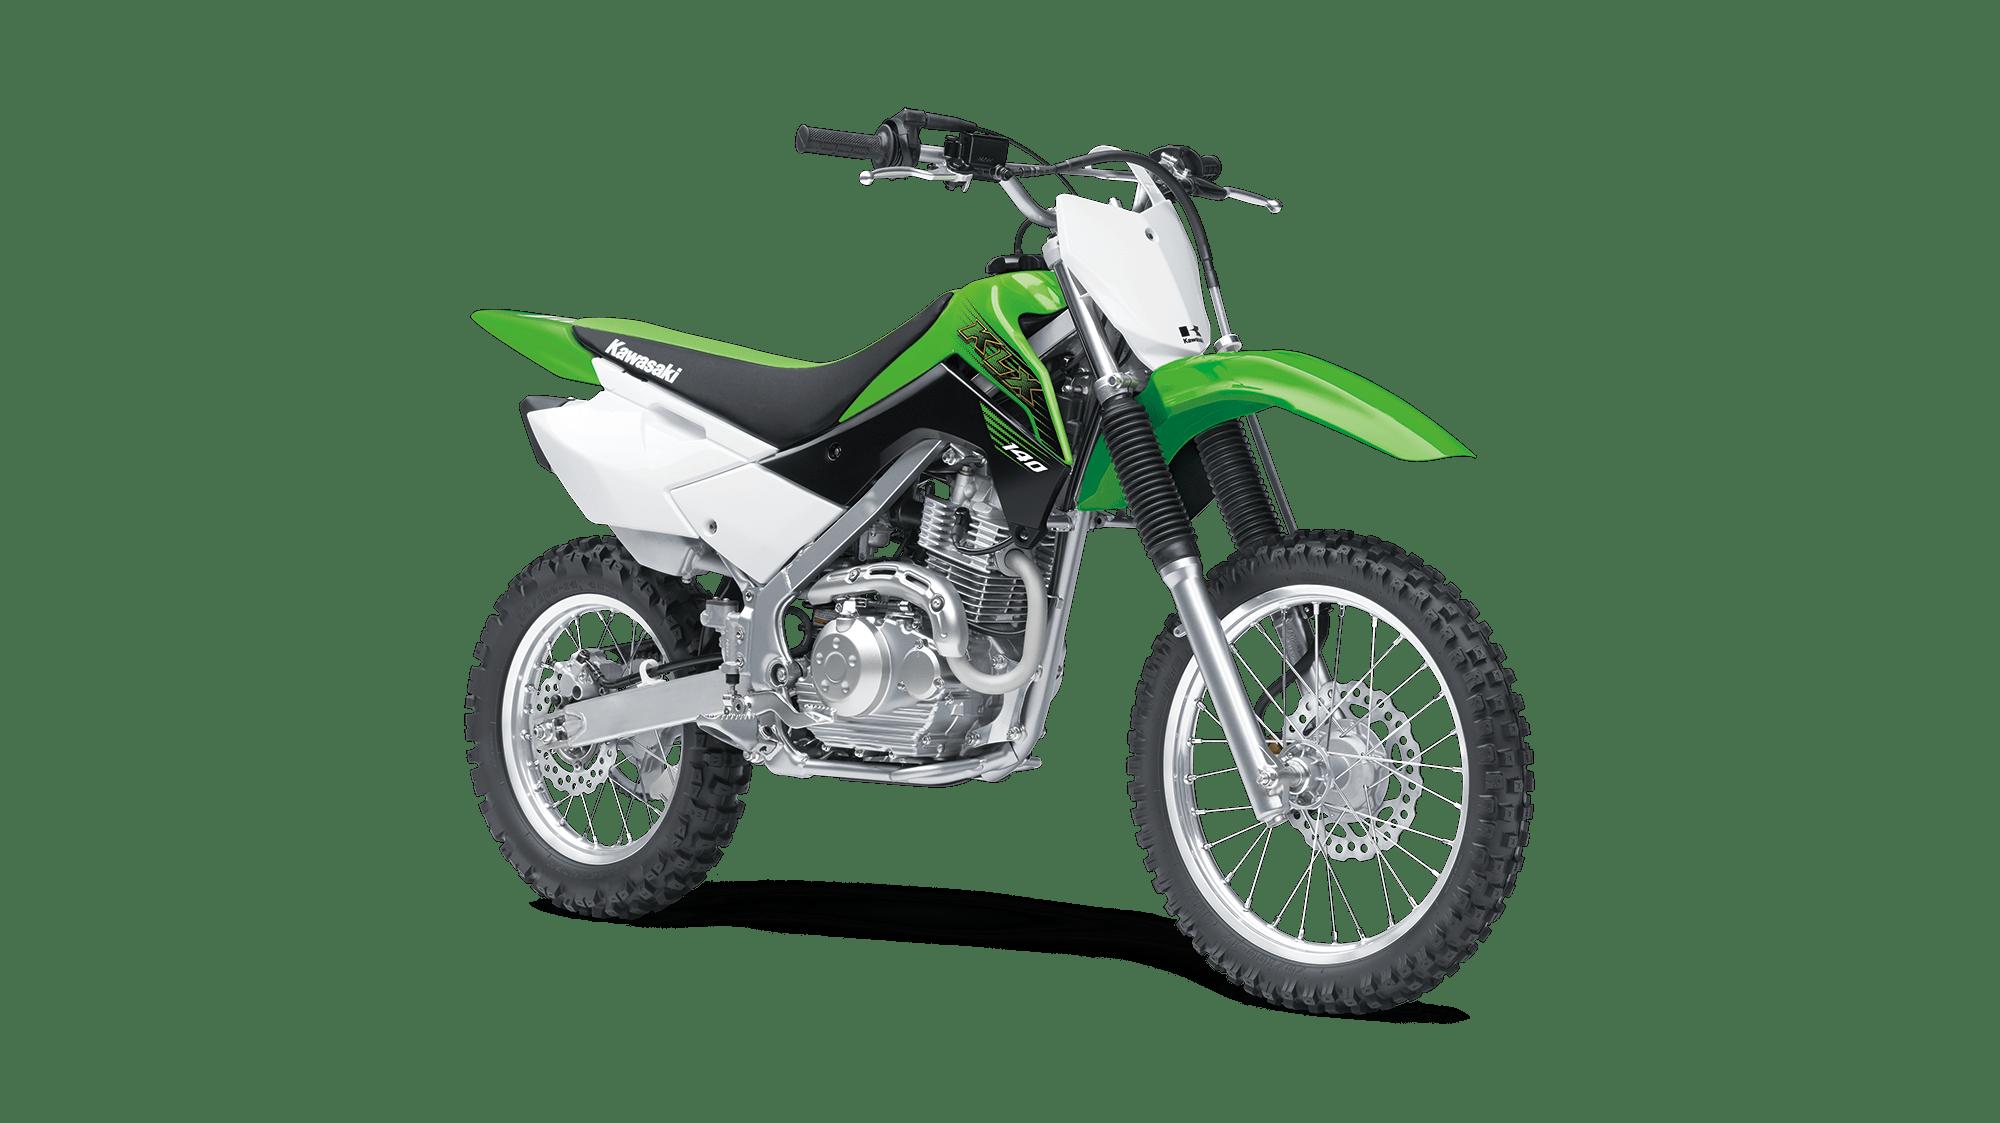 2020 KLX®140 KLR™/KLX® Motorcycle by Kawasaki